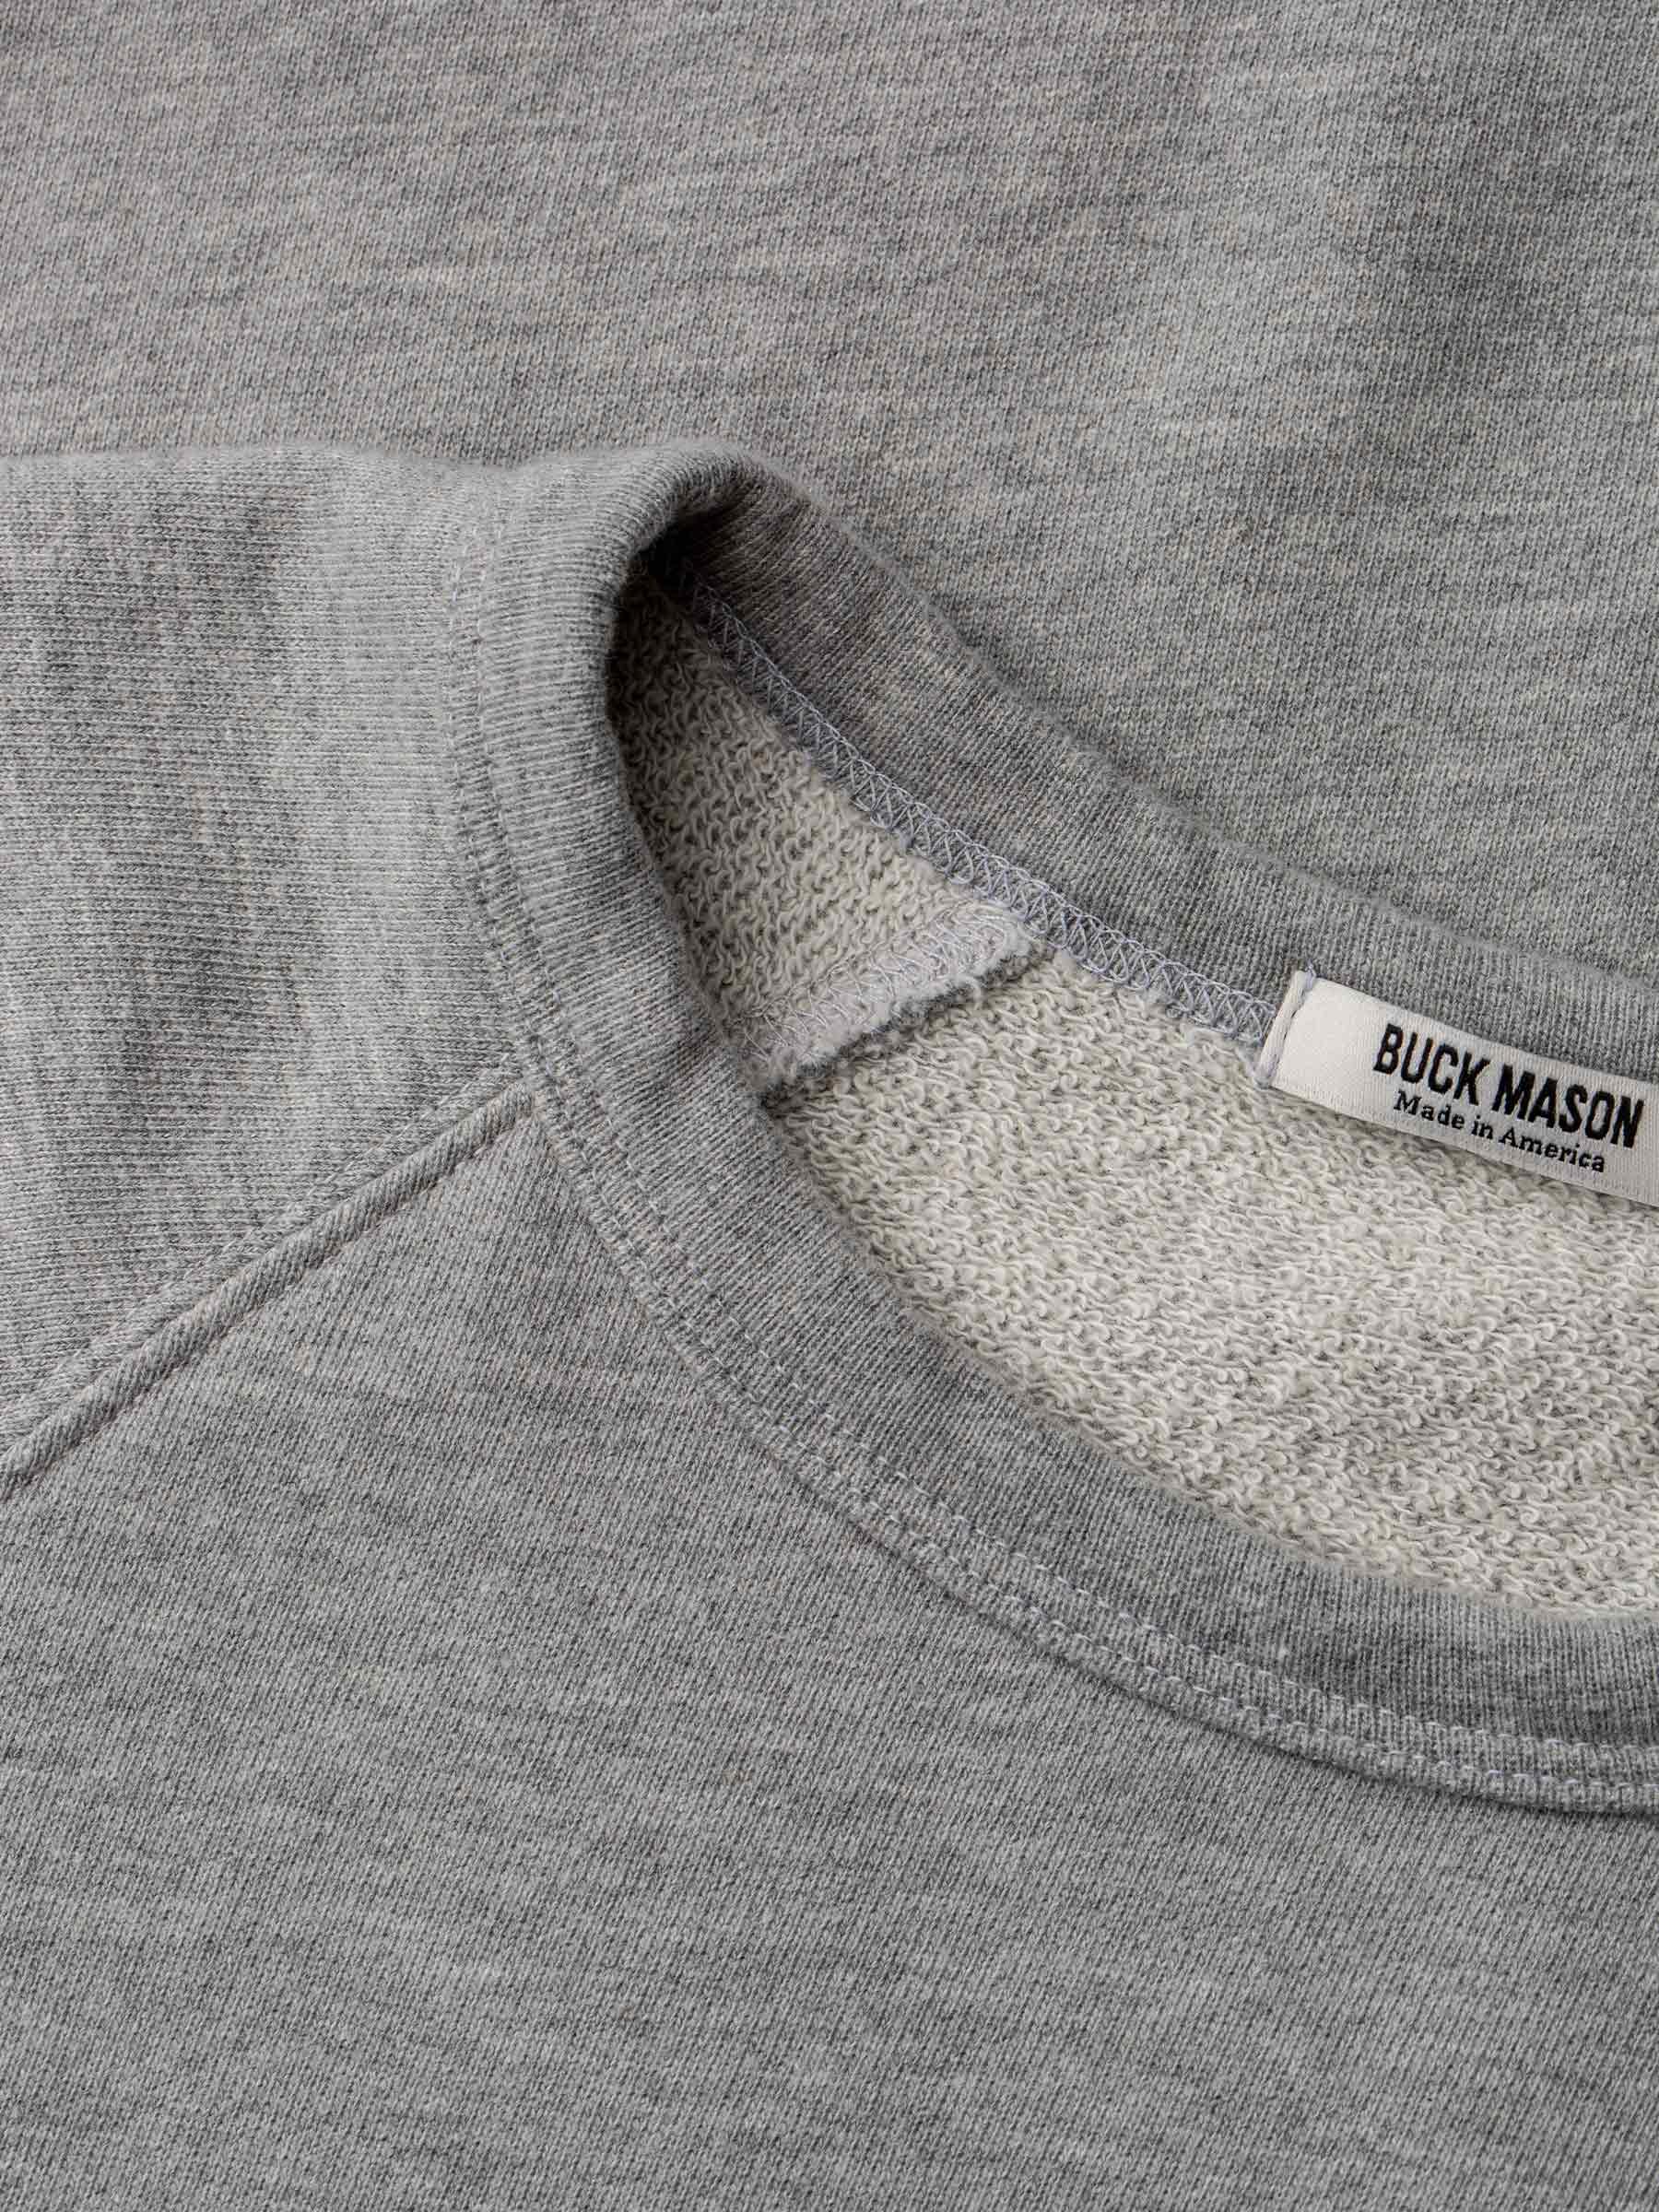 Buck Mason - Rust Venice Wash Vintage French Terry Raglan Sweatshirt